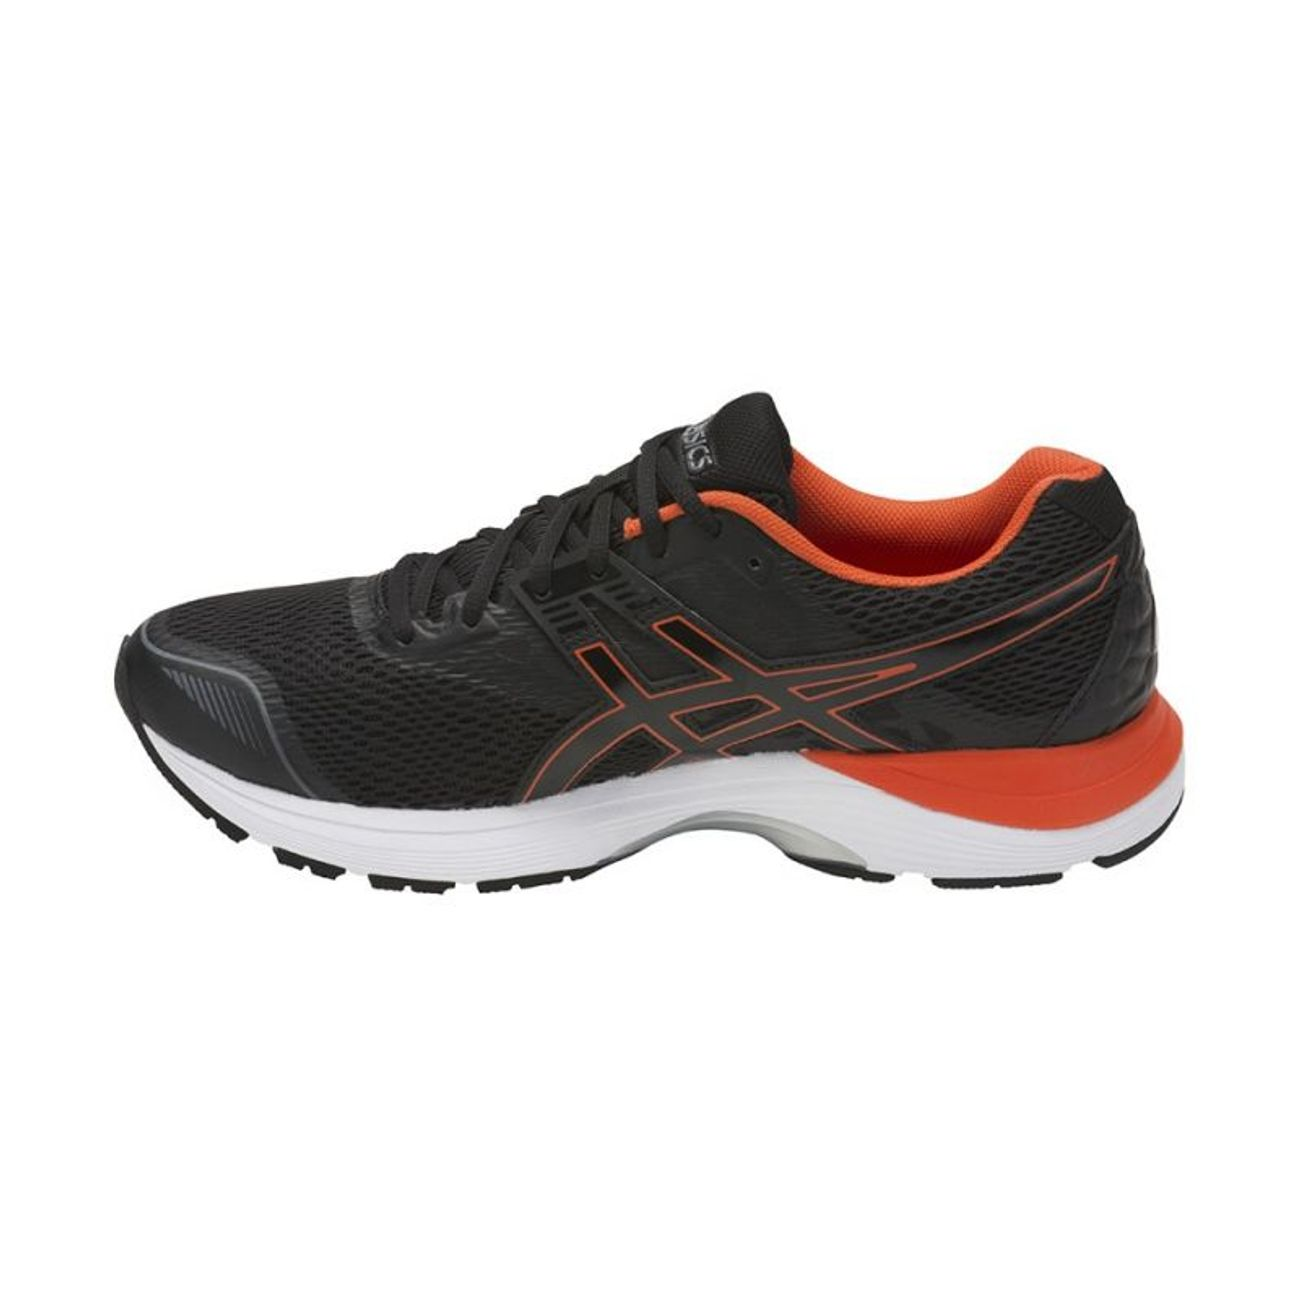 Gel Running Run Chaussures Pulse Black 9 qzSUMpV